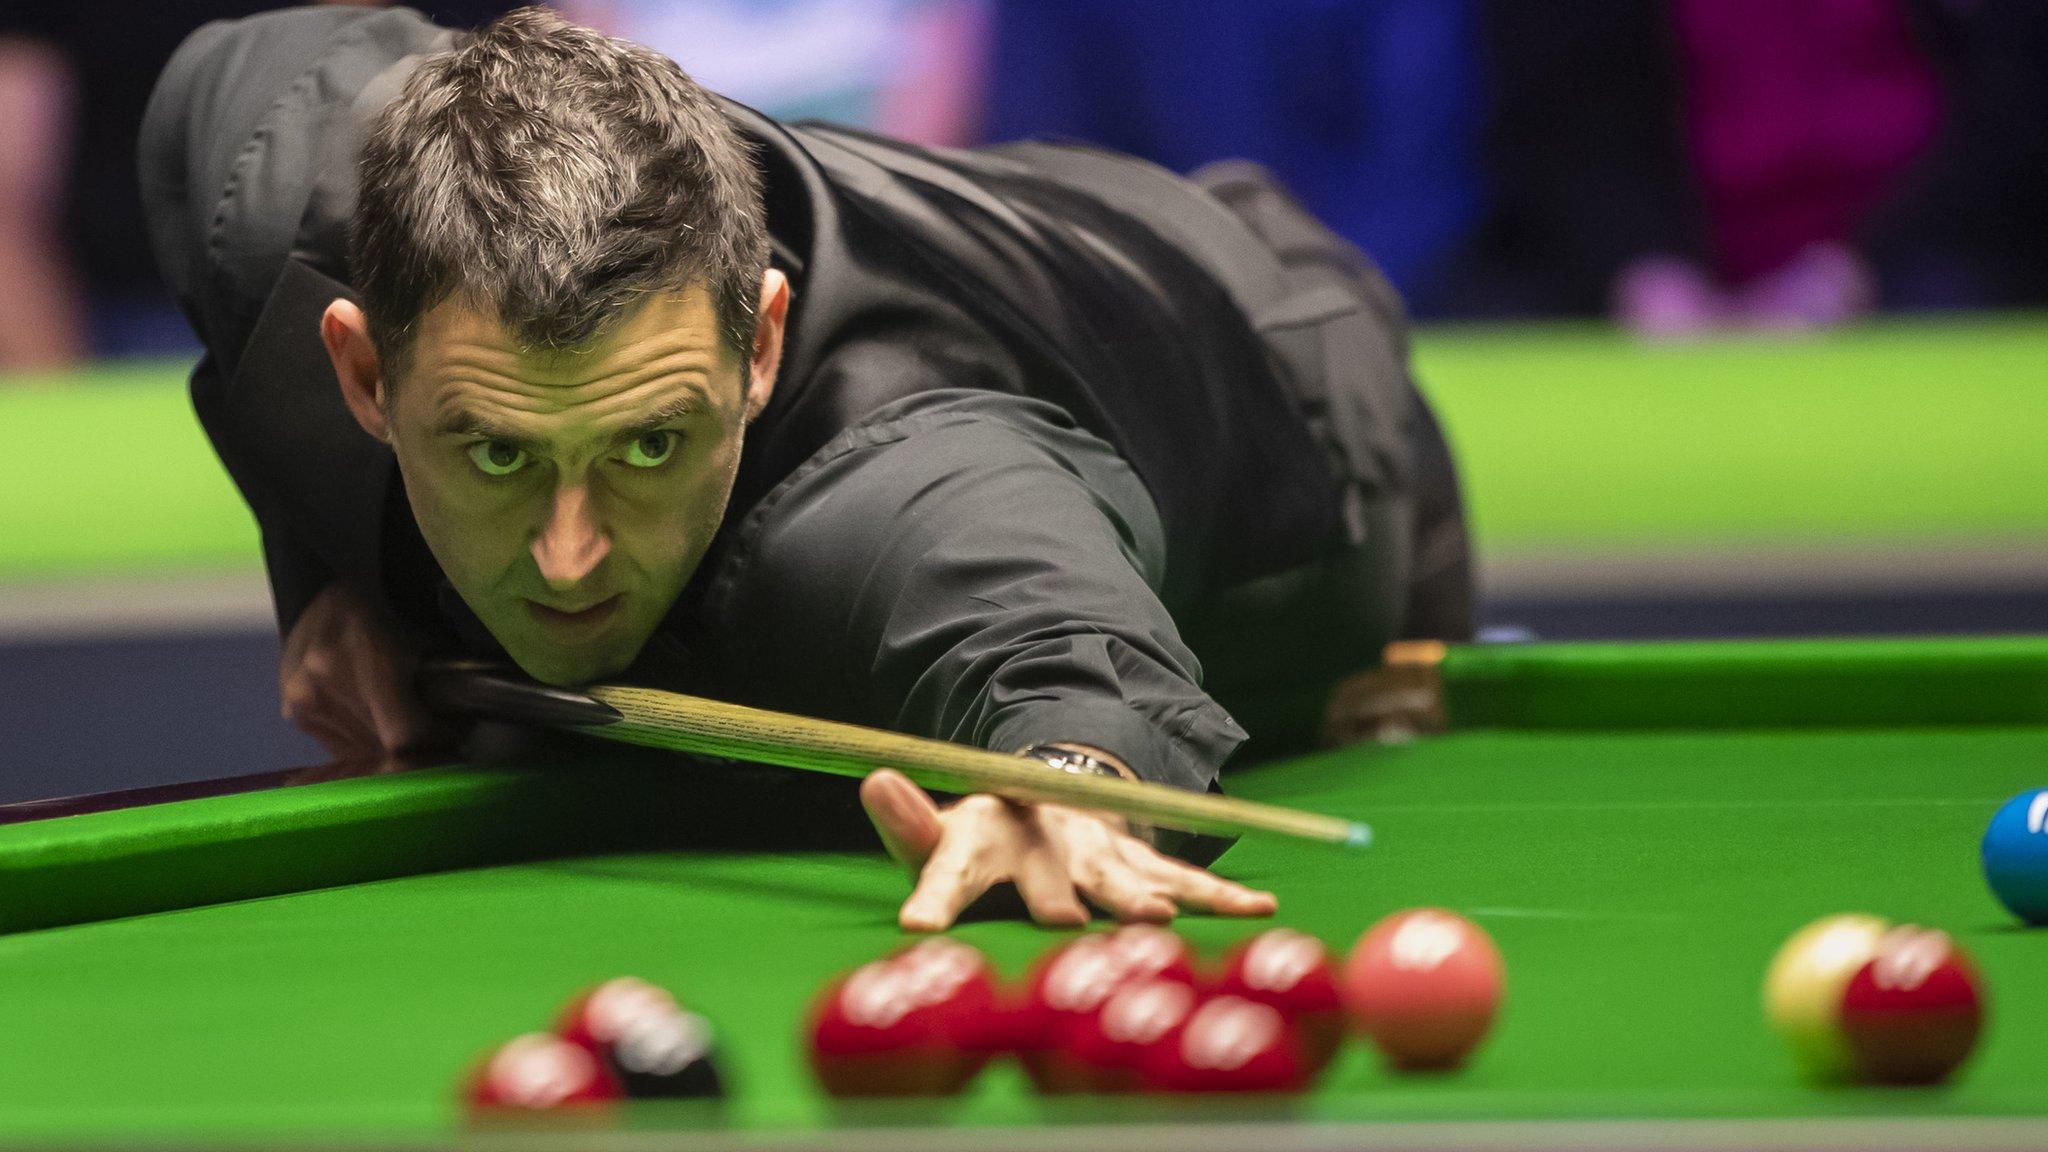 UK Championship: Ronnie O'Sullivan dispatches Jack Lisowski in York